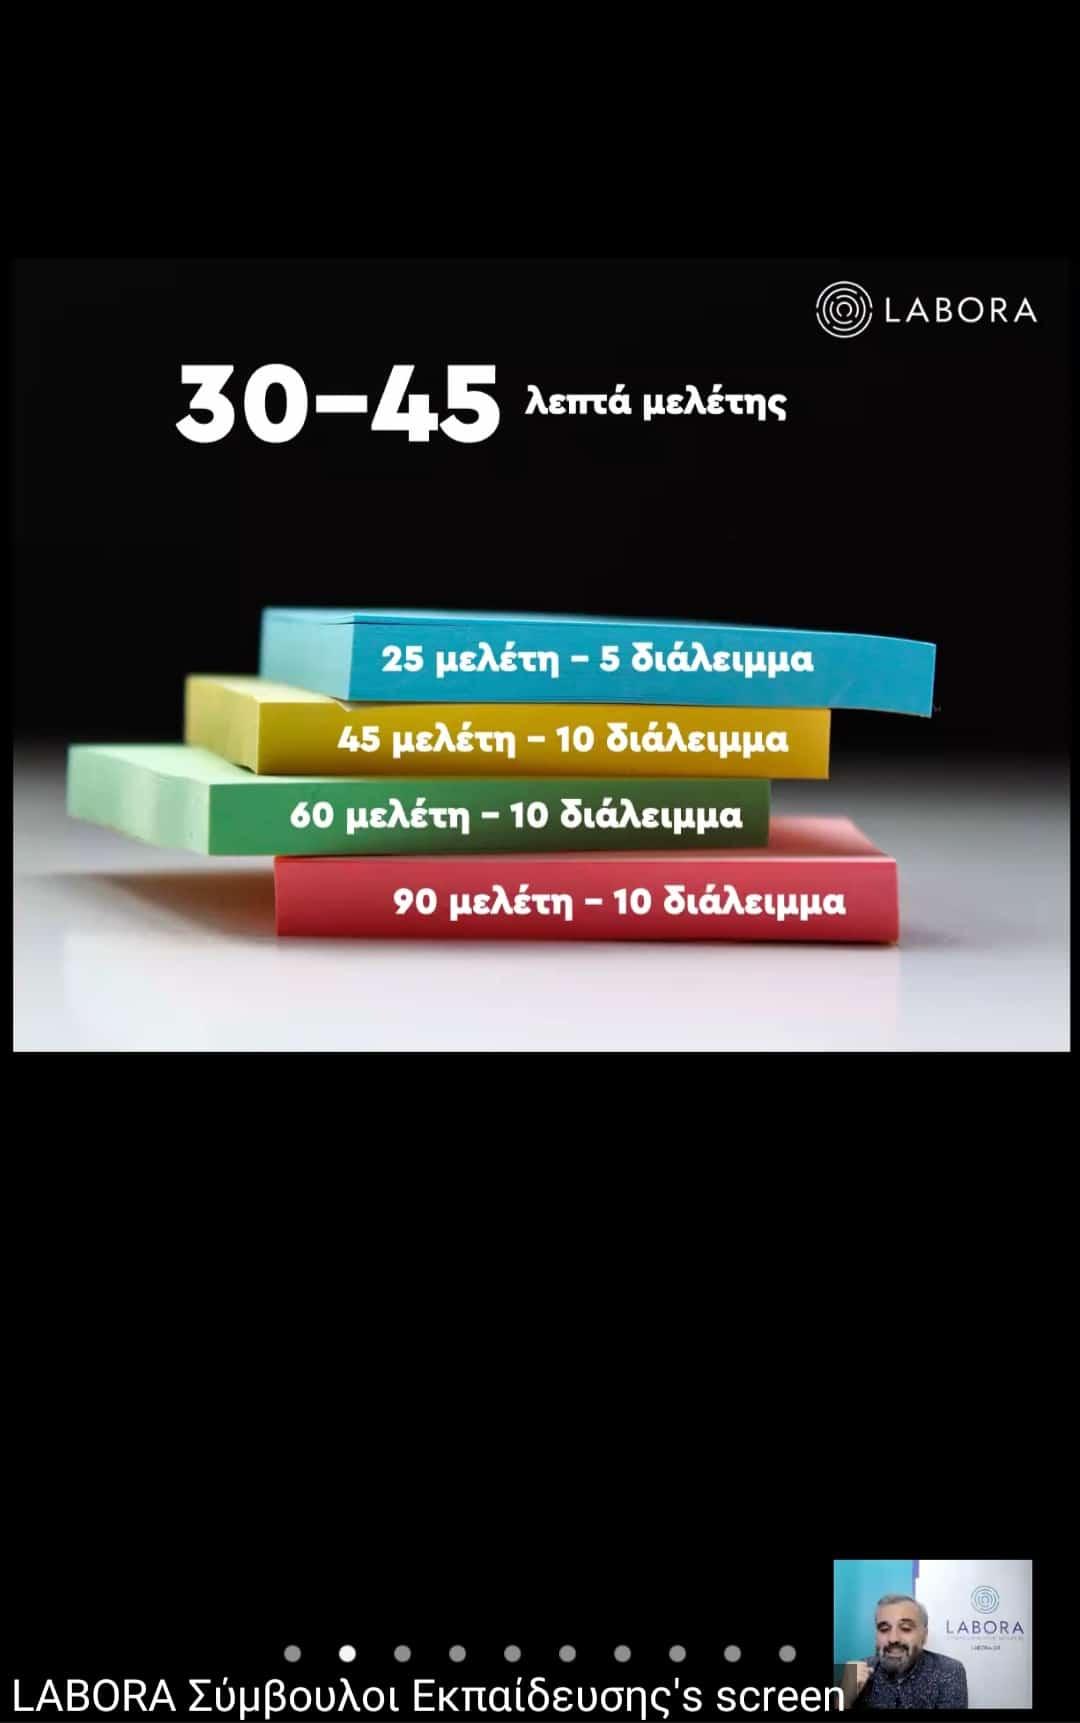 IMG_20201214_111920